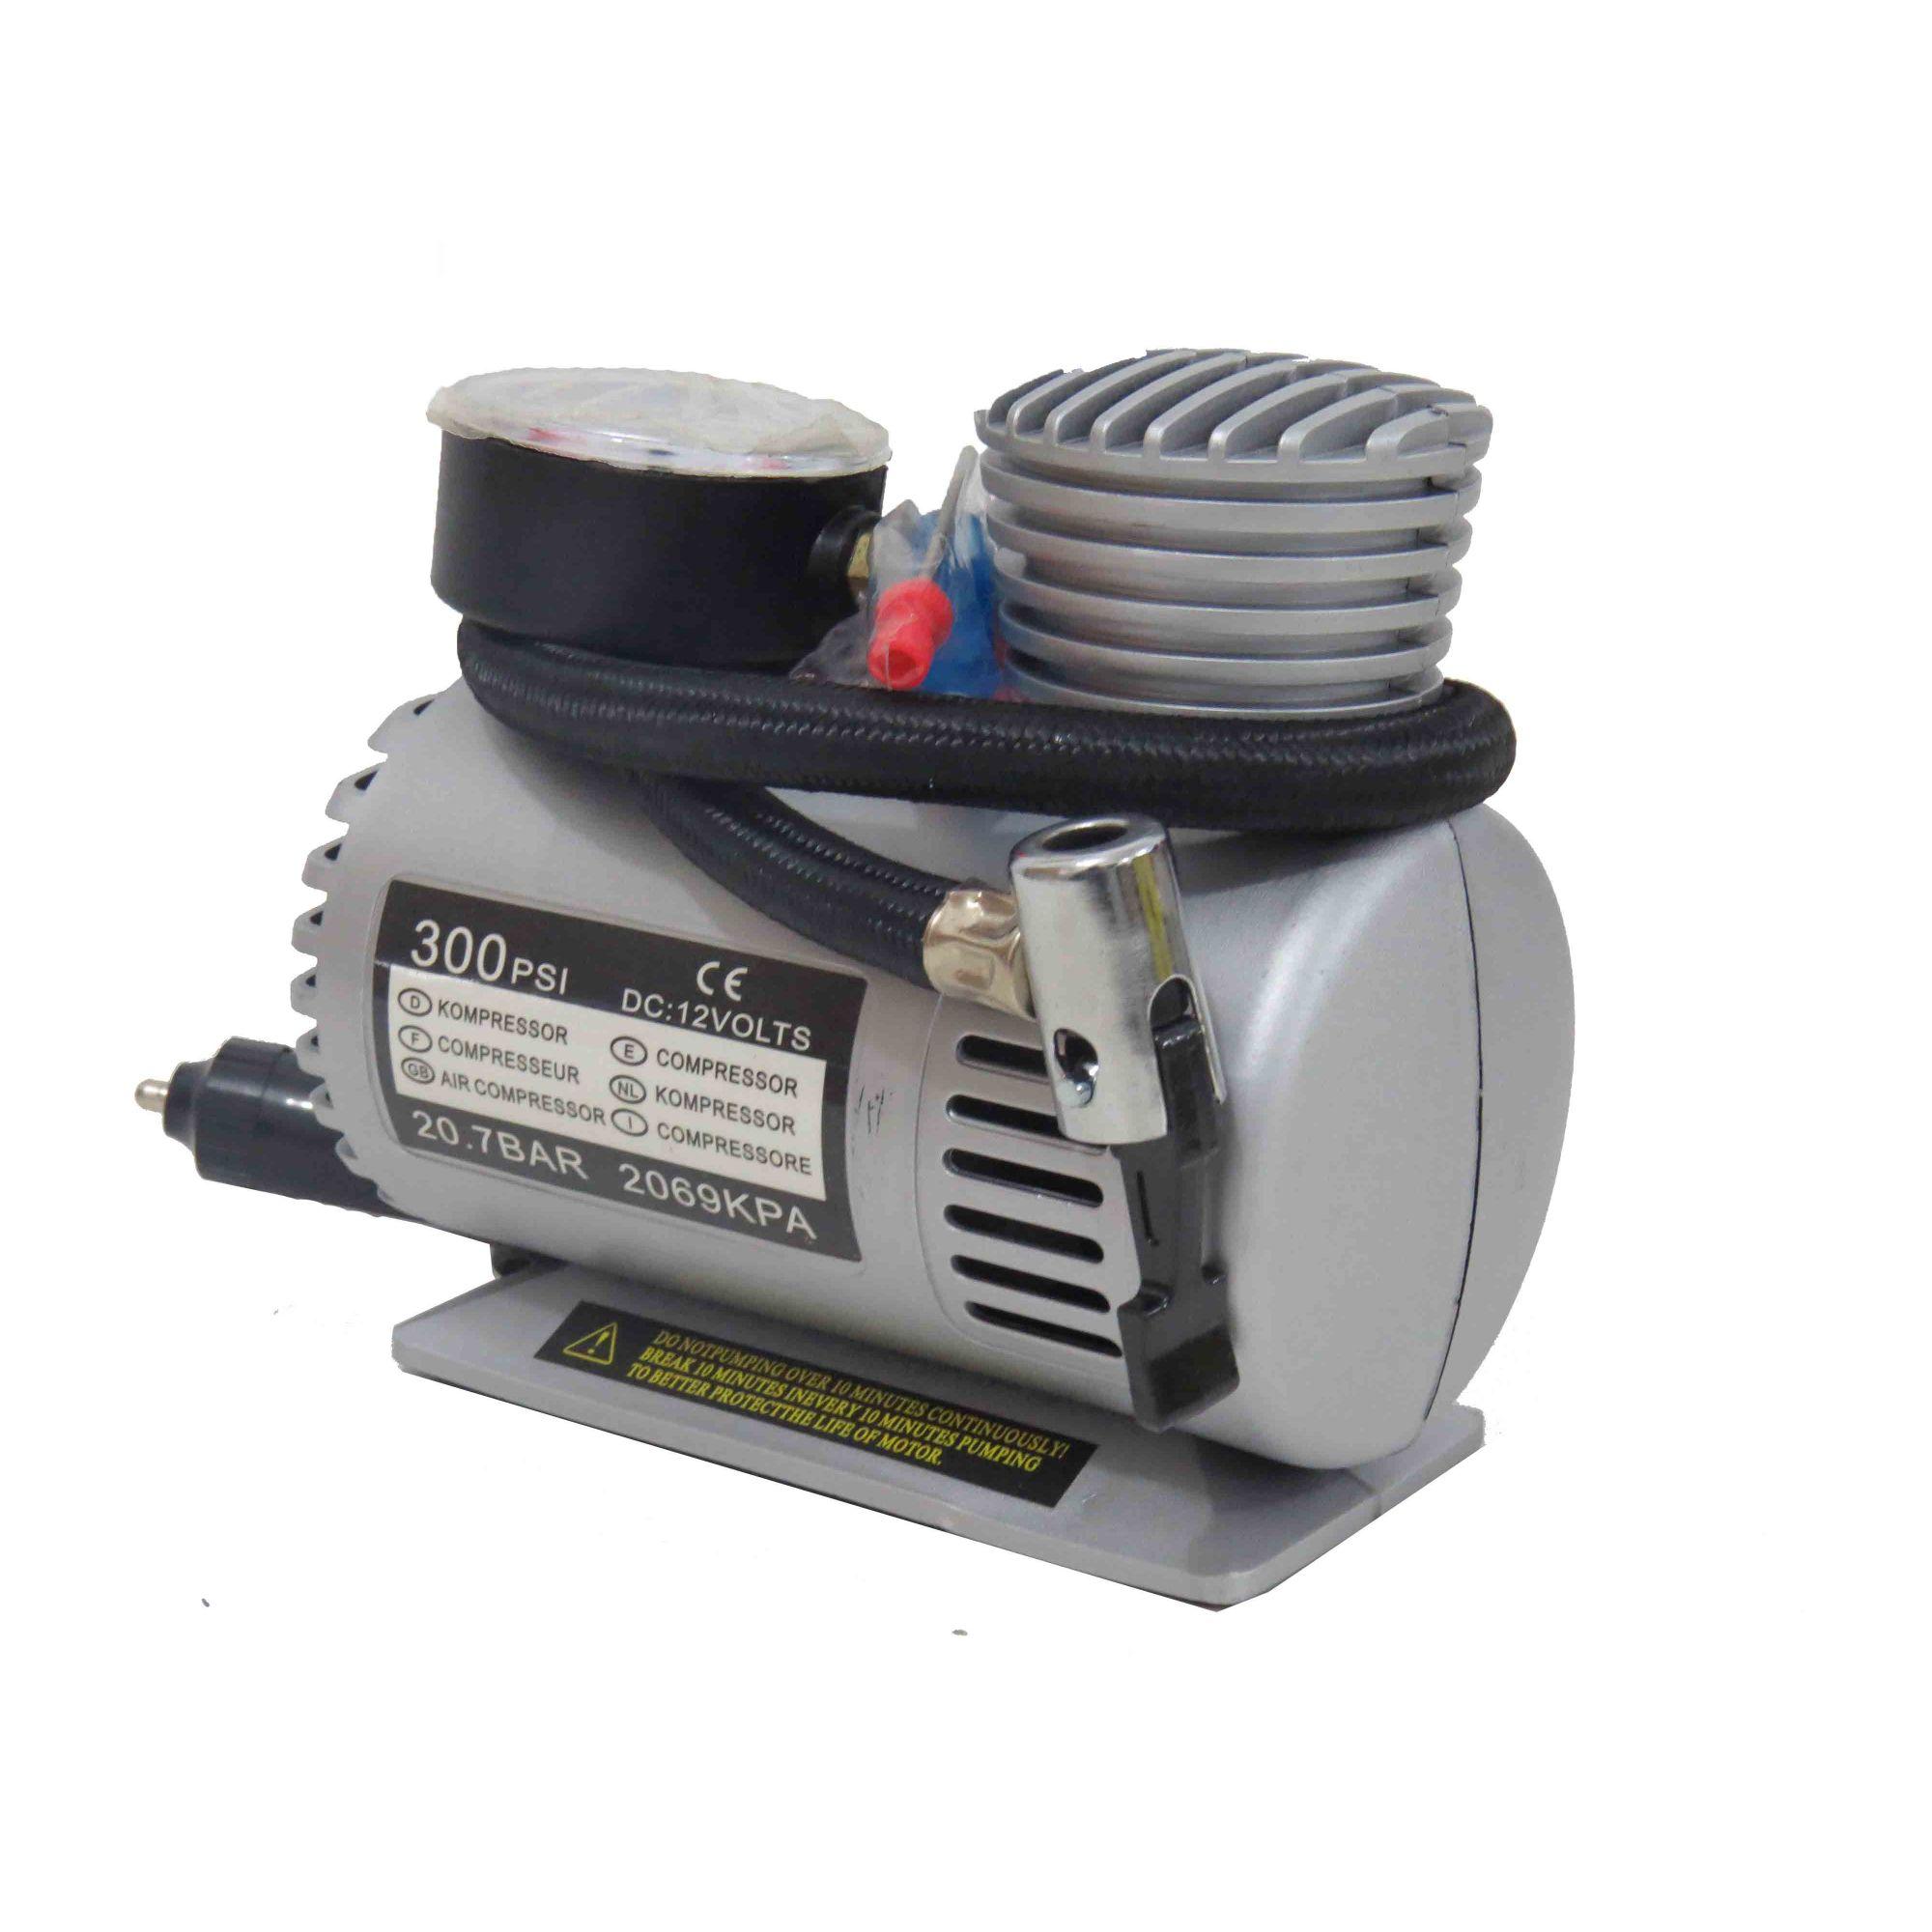 Mini Compressor De Ar P/ Automóveis 300psi 12v